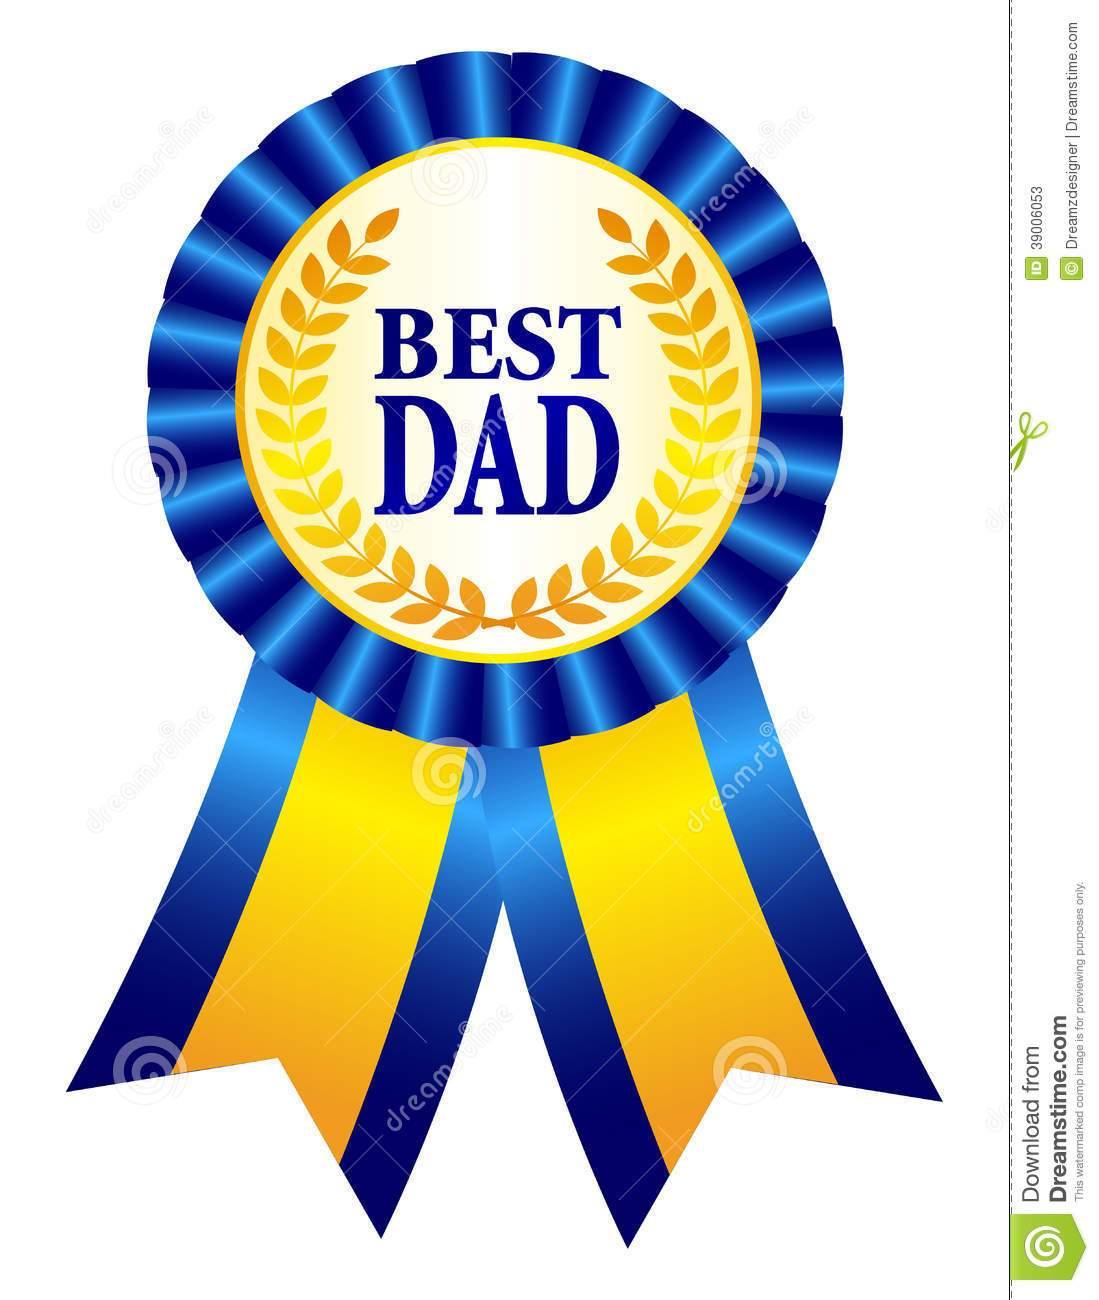 Best dad clipart 1 » Clipart Portal.